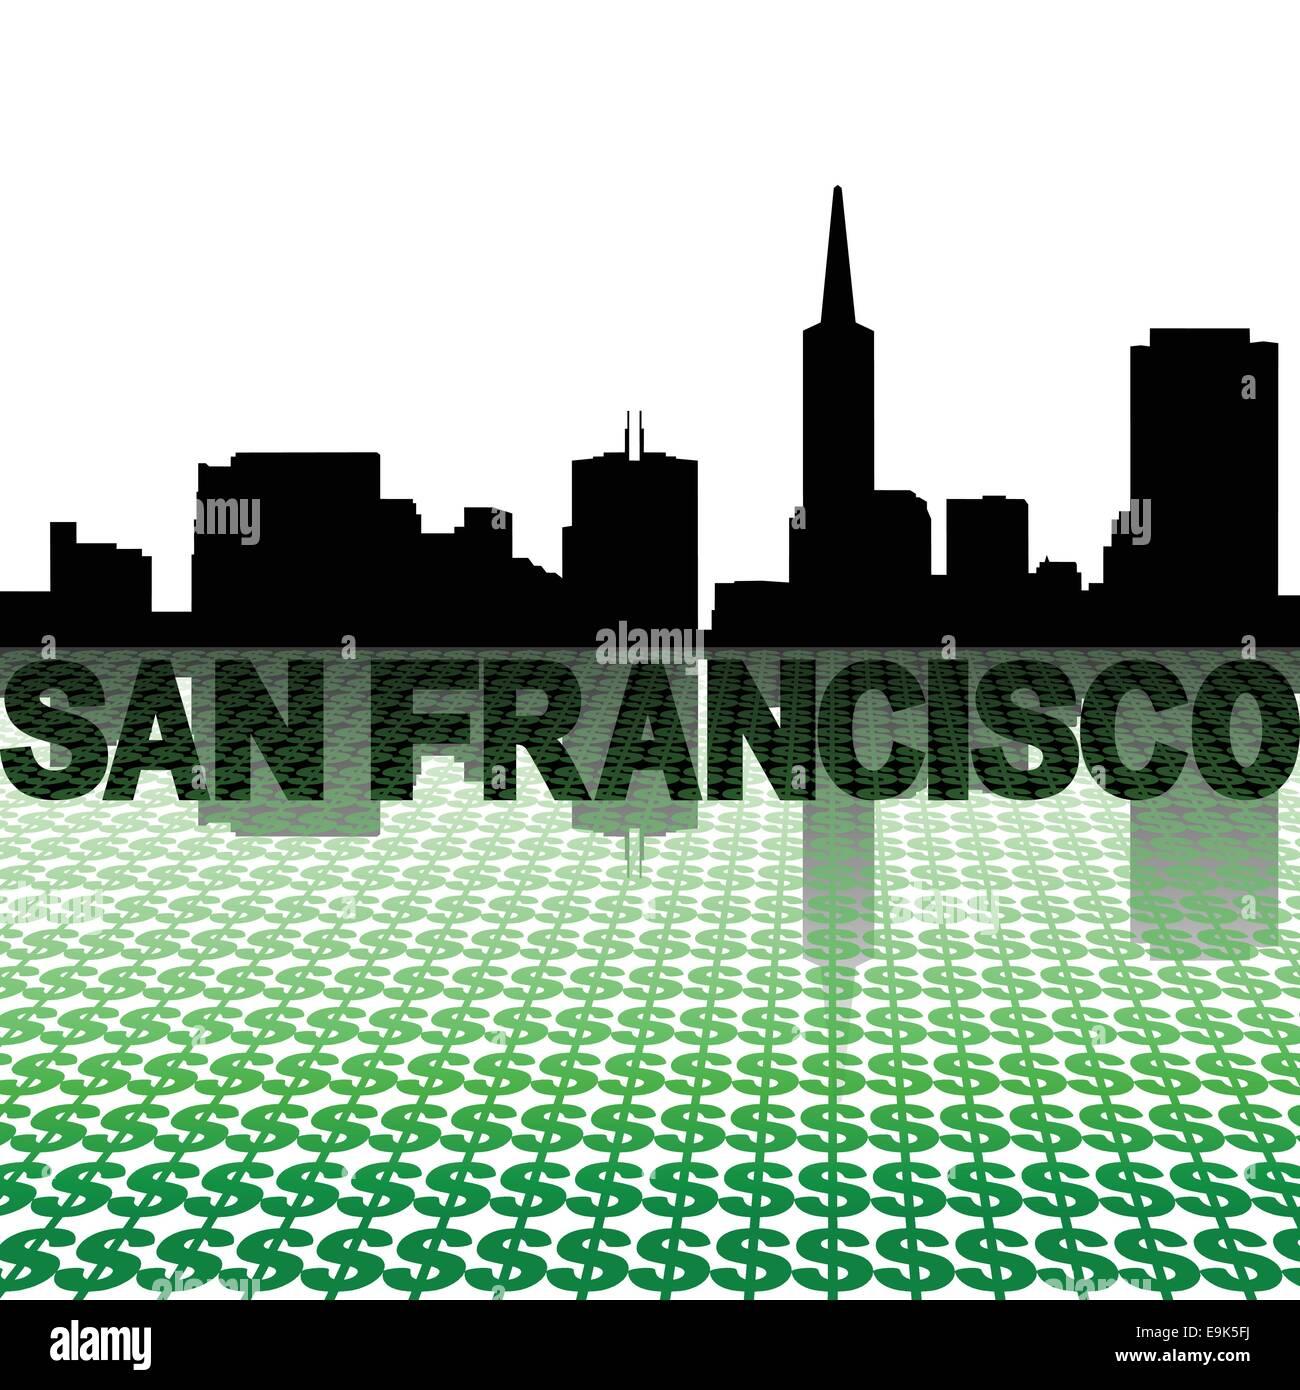 San Francisco Skyline Reflected With Dollar Symbols Illustration